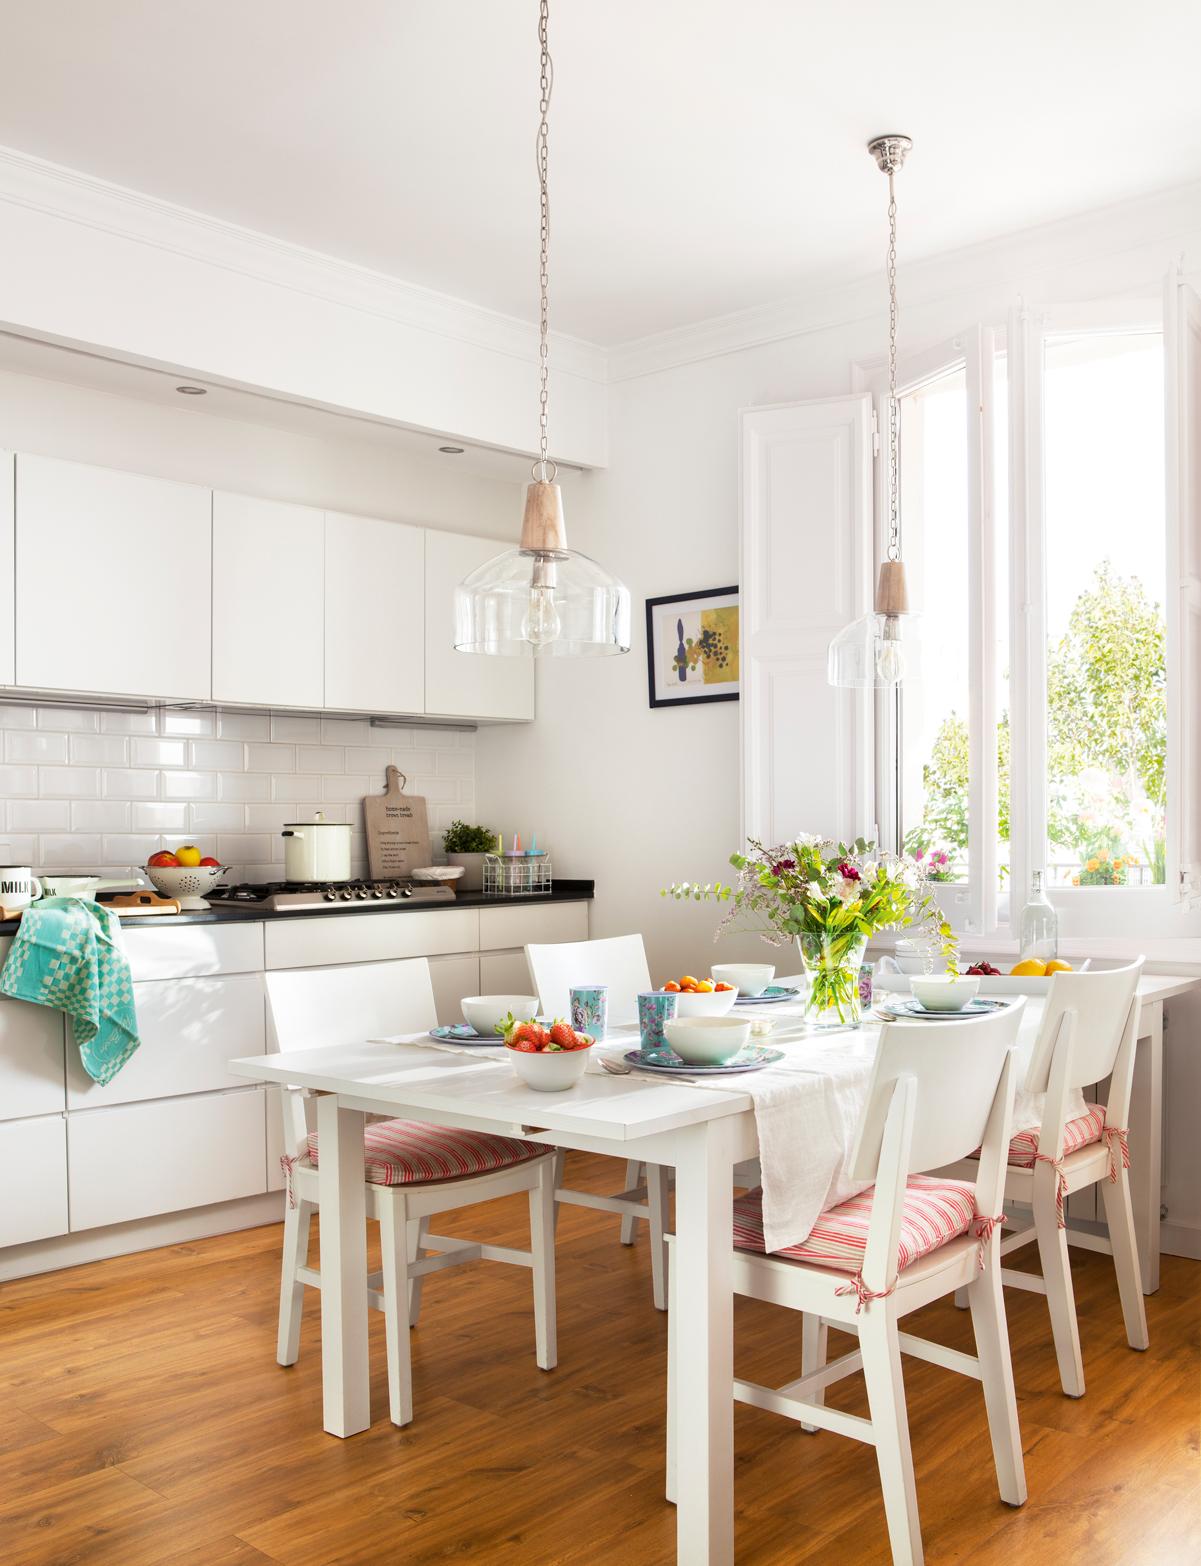 10 piezas imprescindibles para casas peque as - Cocina blanca encimera negra ...